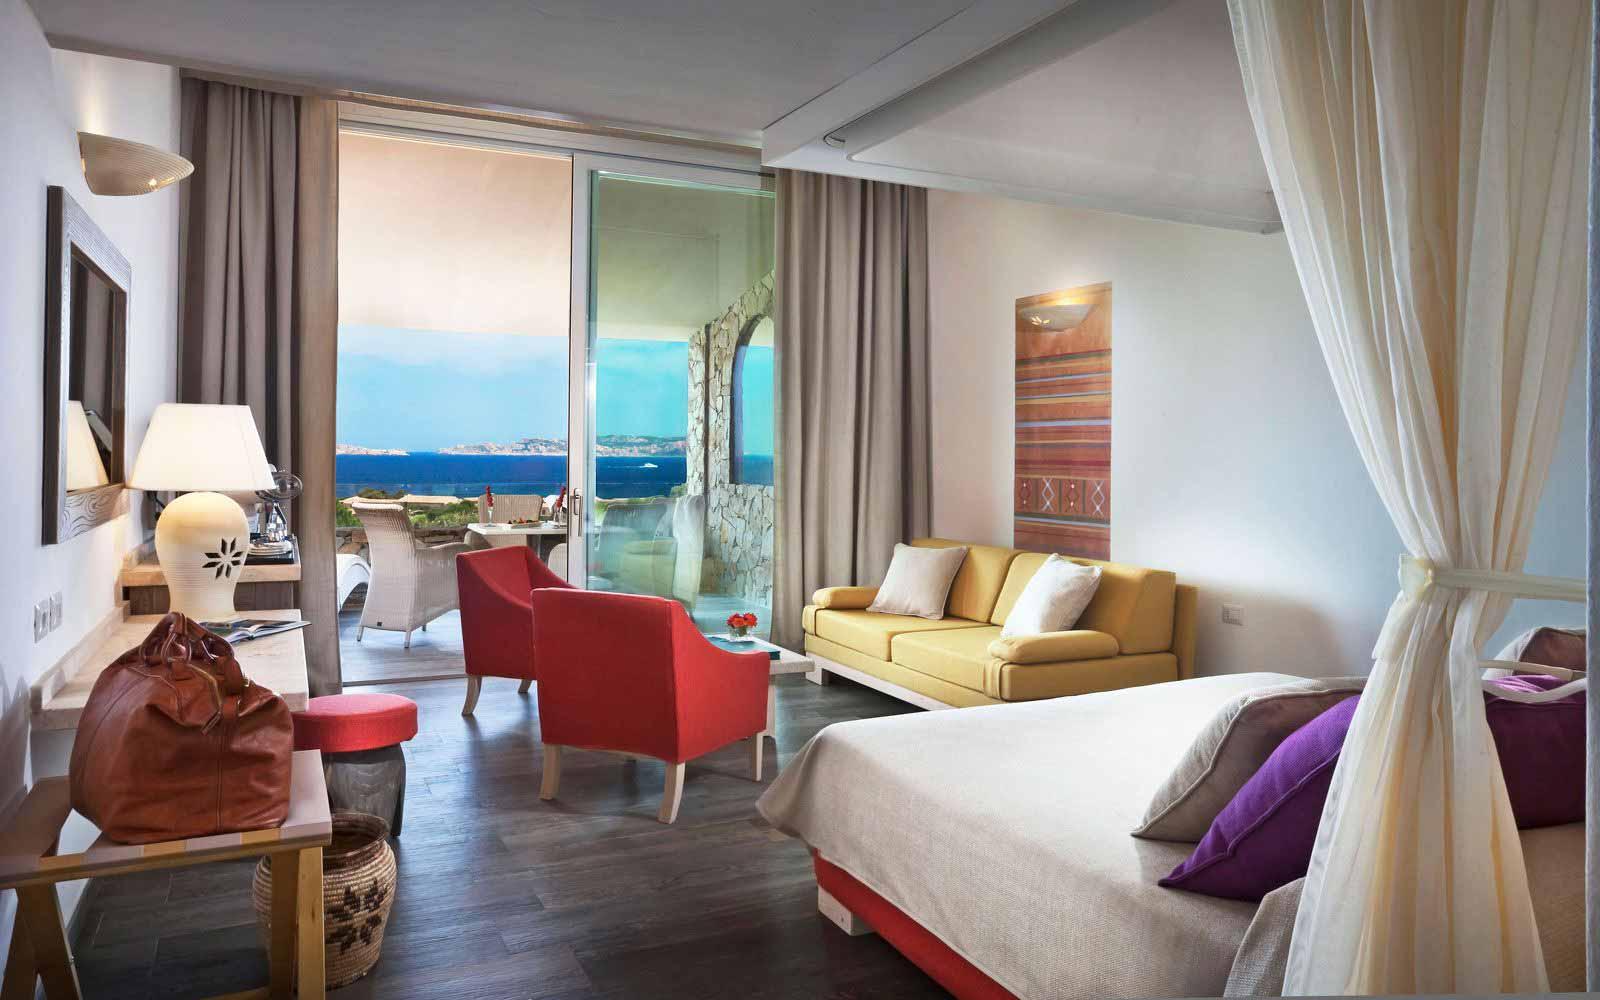 Junior Suite Family Exclusive at  Hotel Valle Dell'Erica - La Licciola